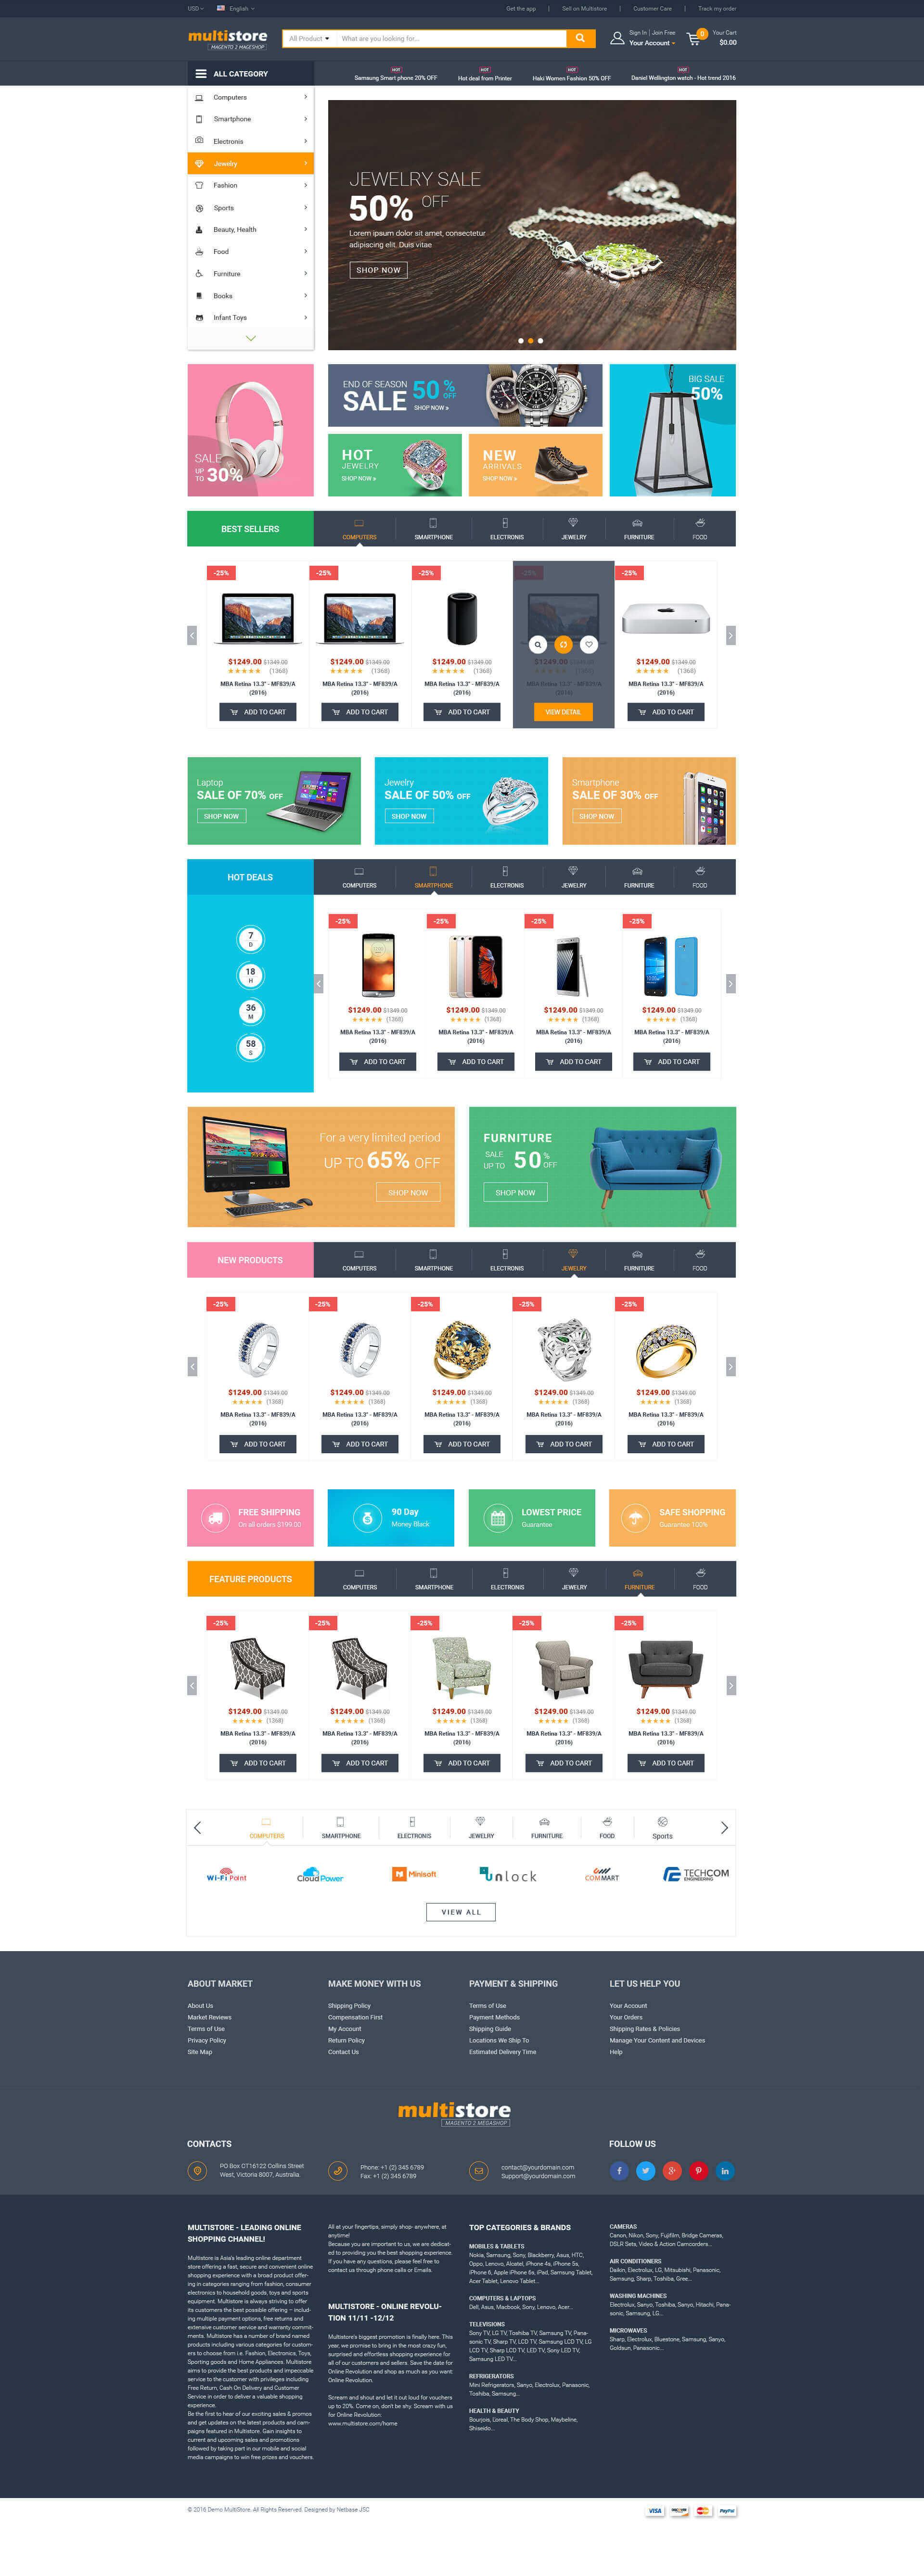 Multistore Homepage